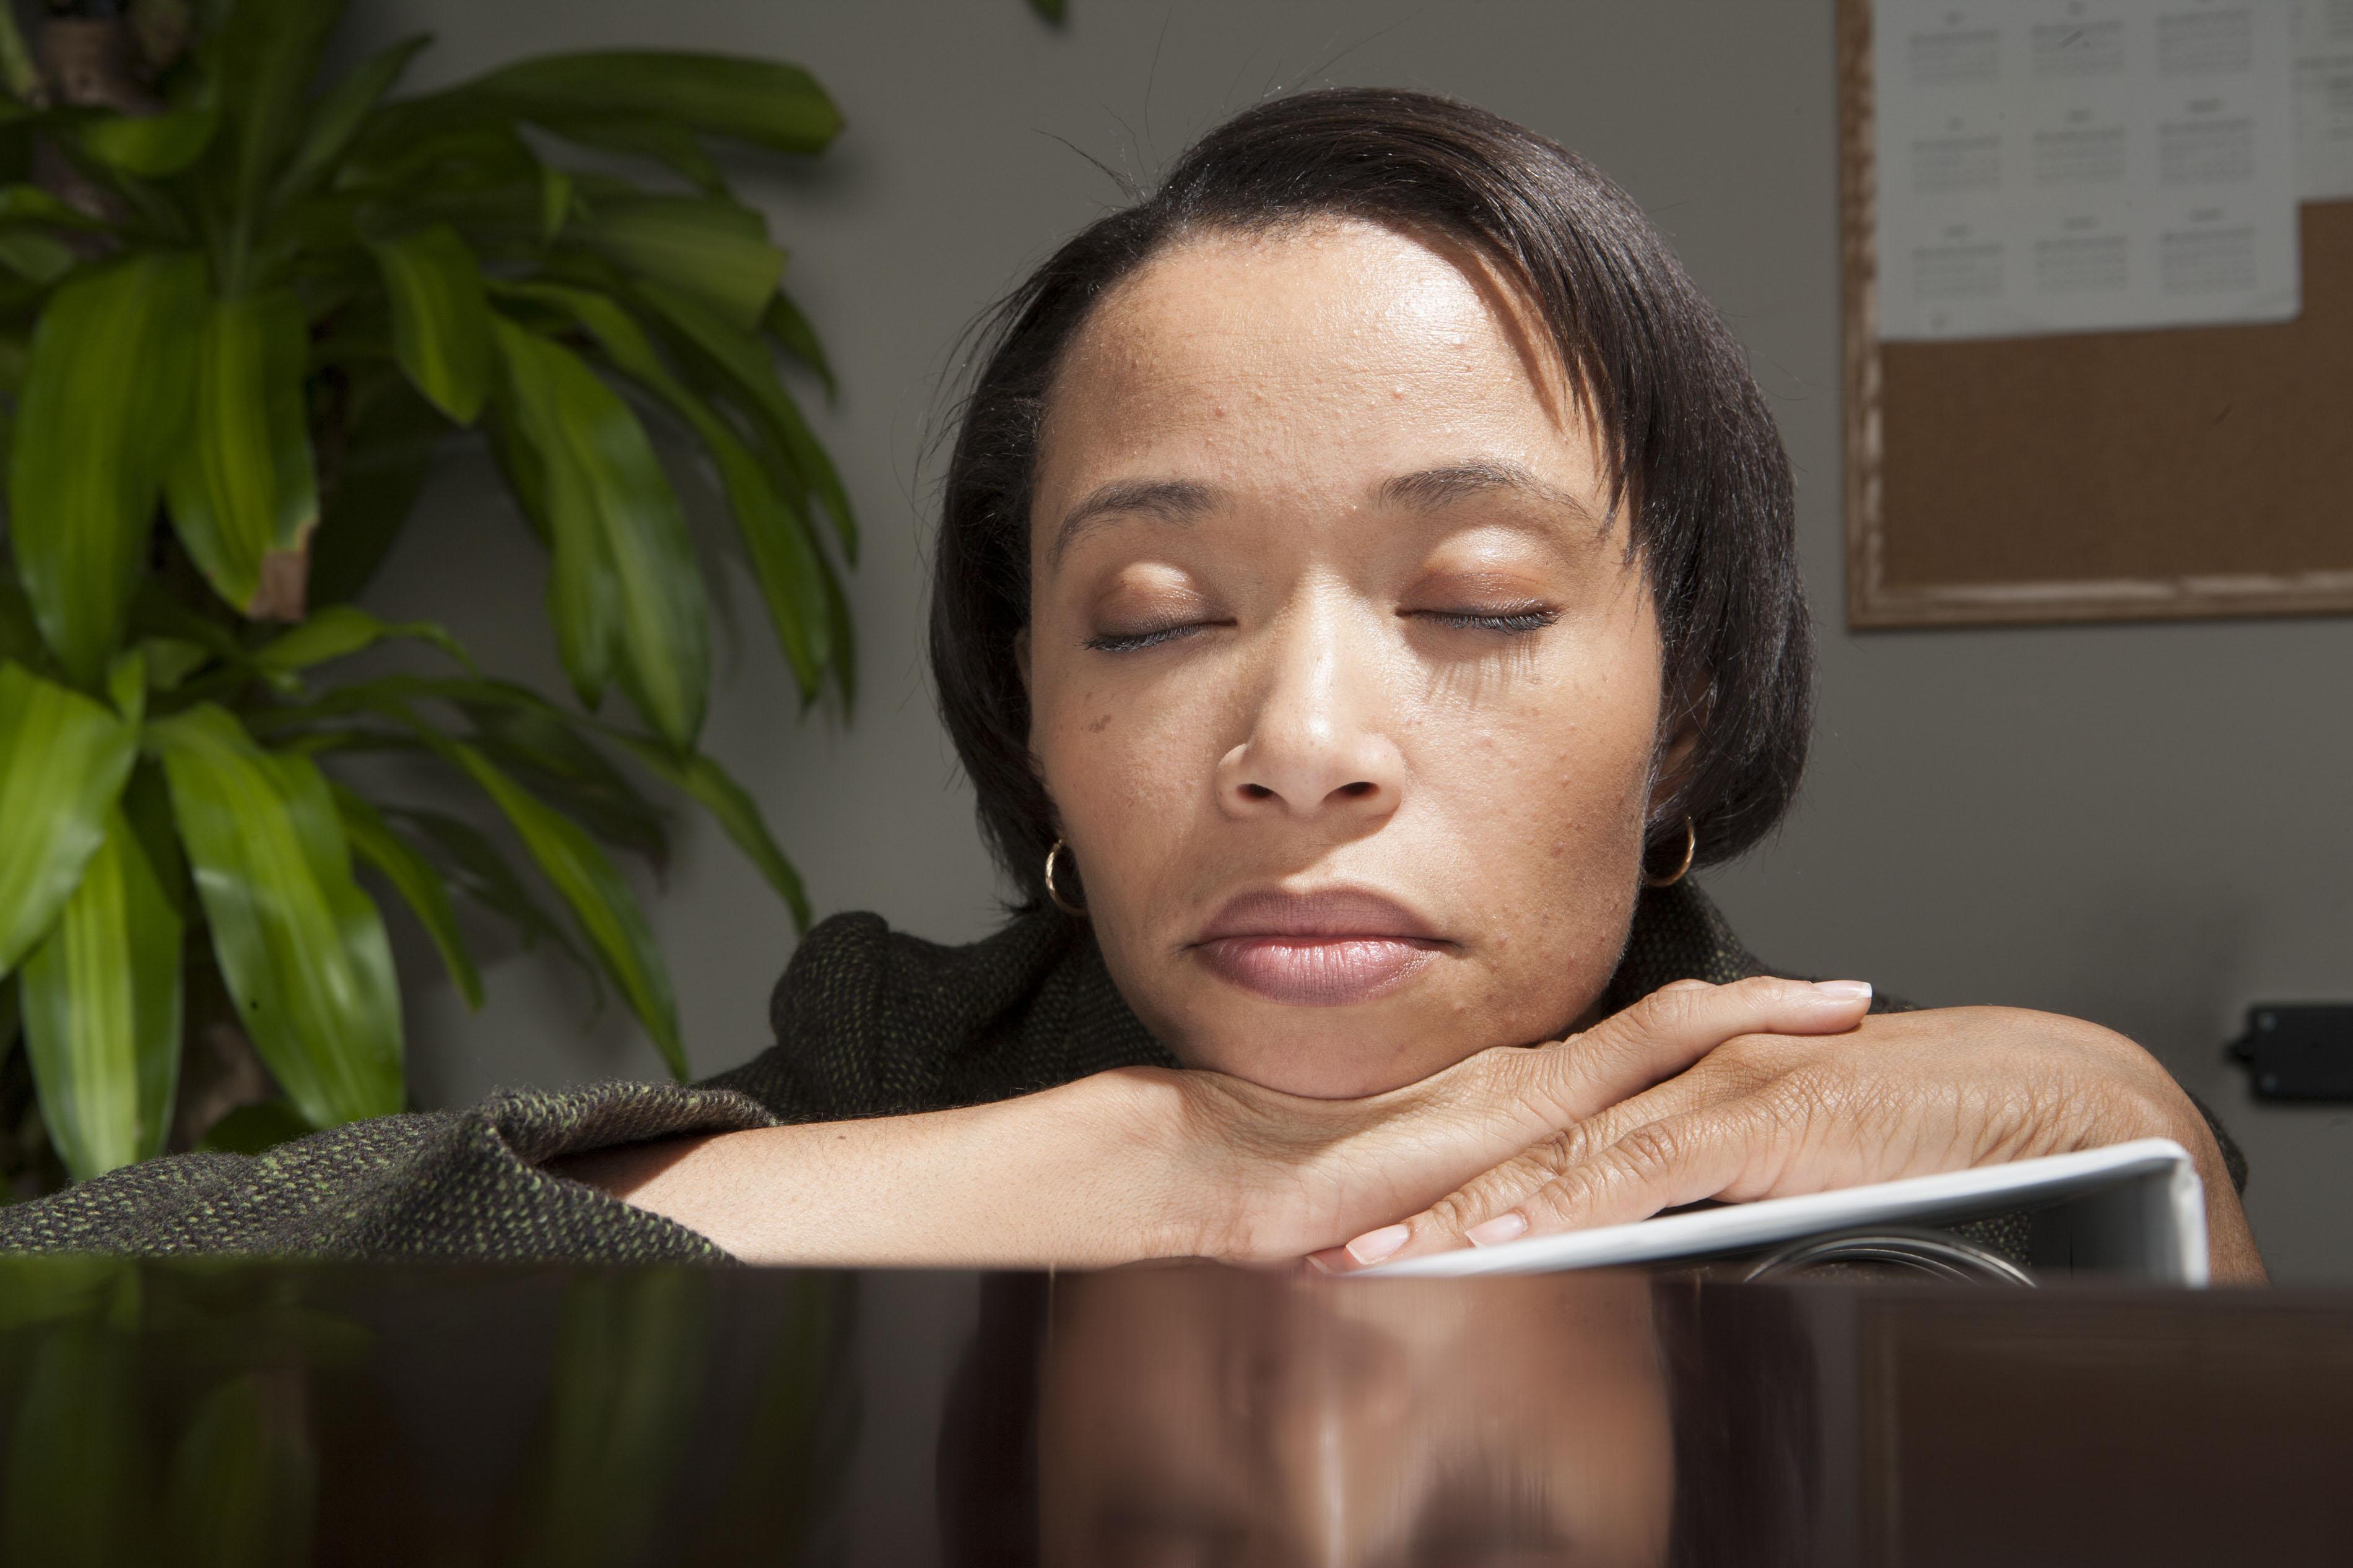 Menopause sleep deprivation